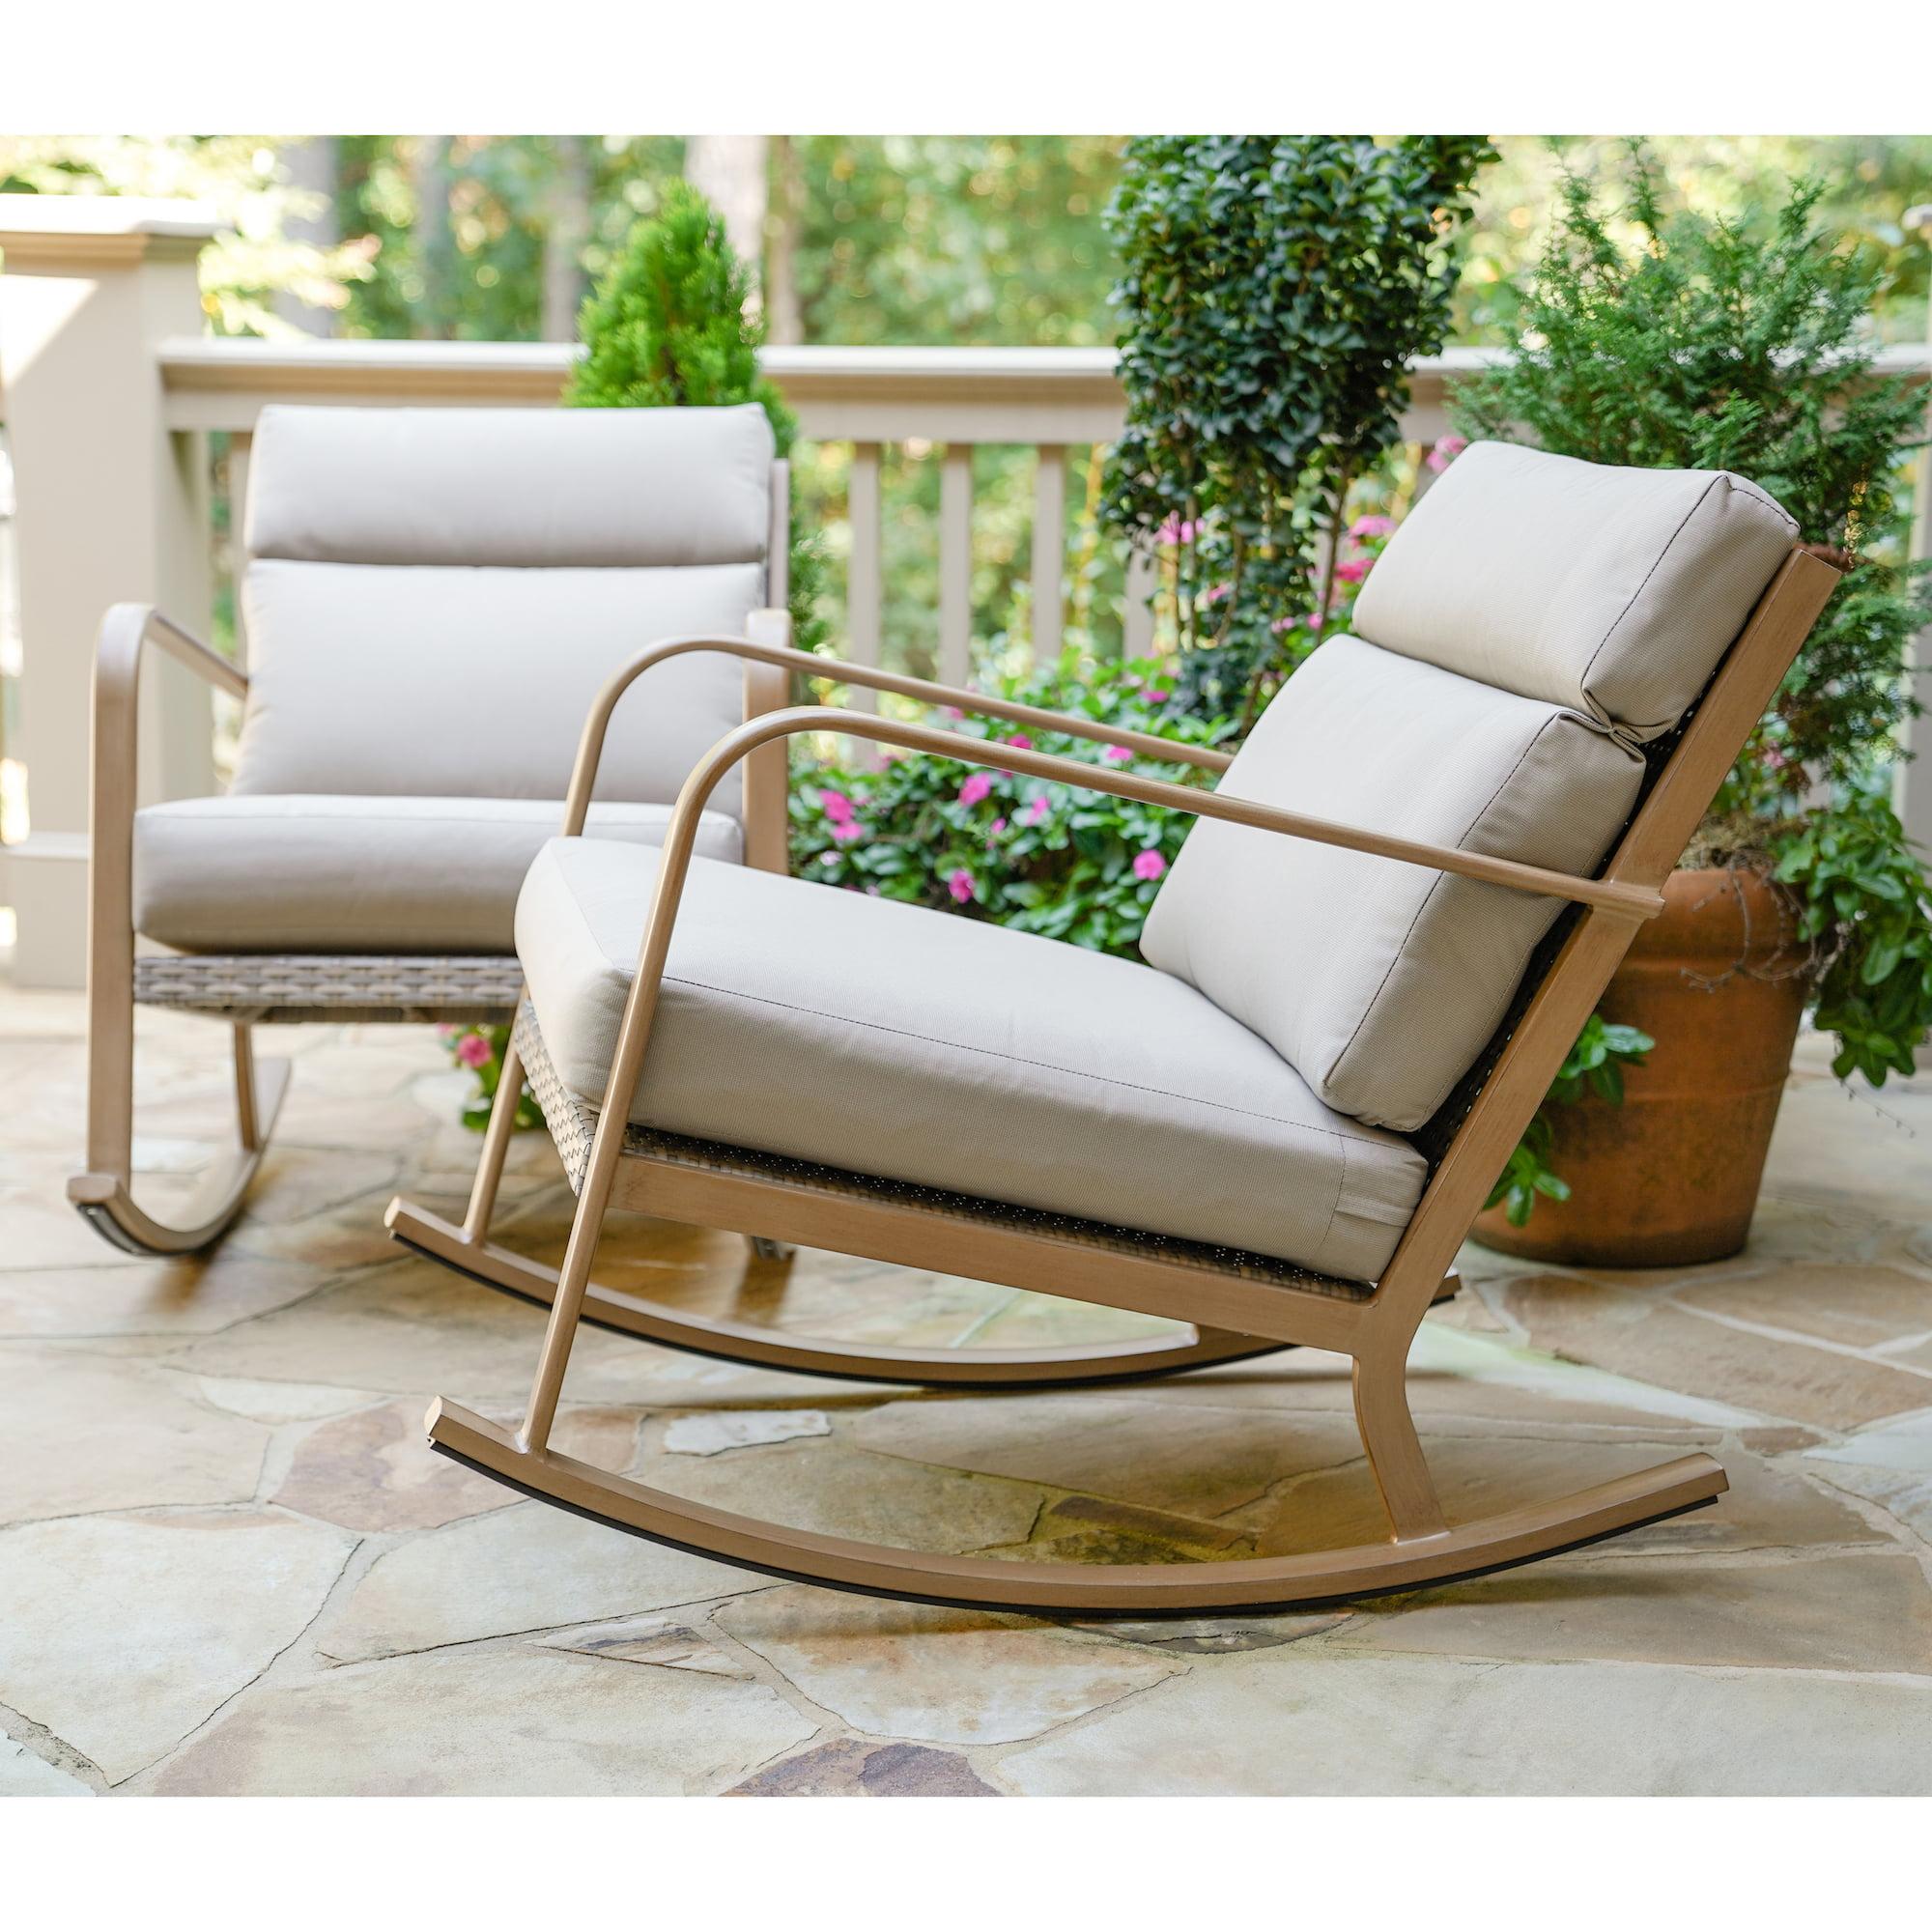 Talbot Outdoor Rocking Chair, Outdoor Furniture Rocking Chair